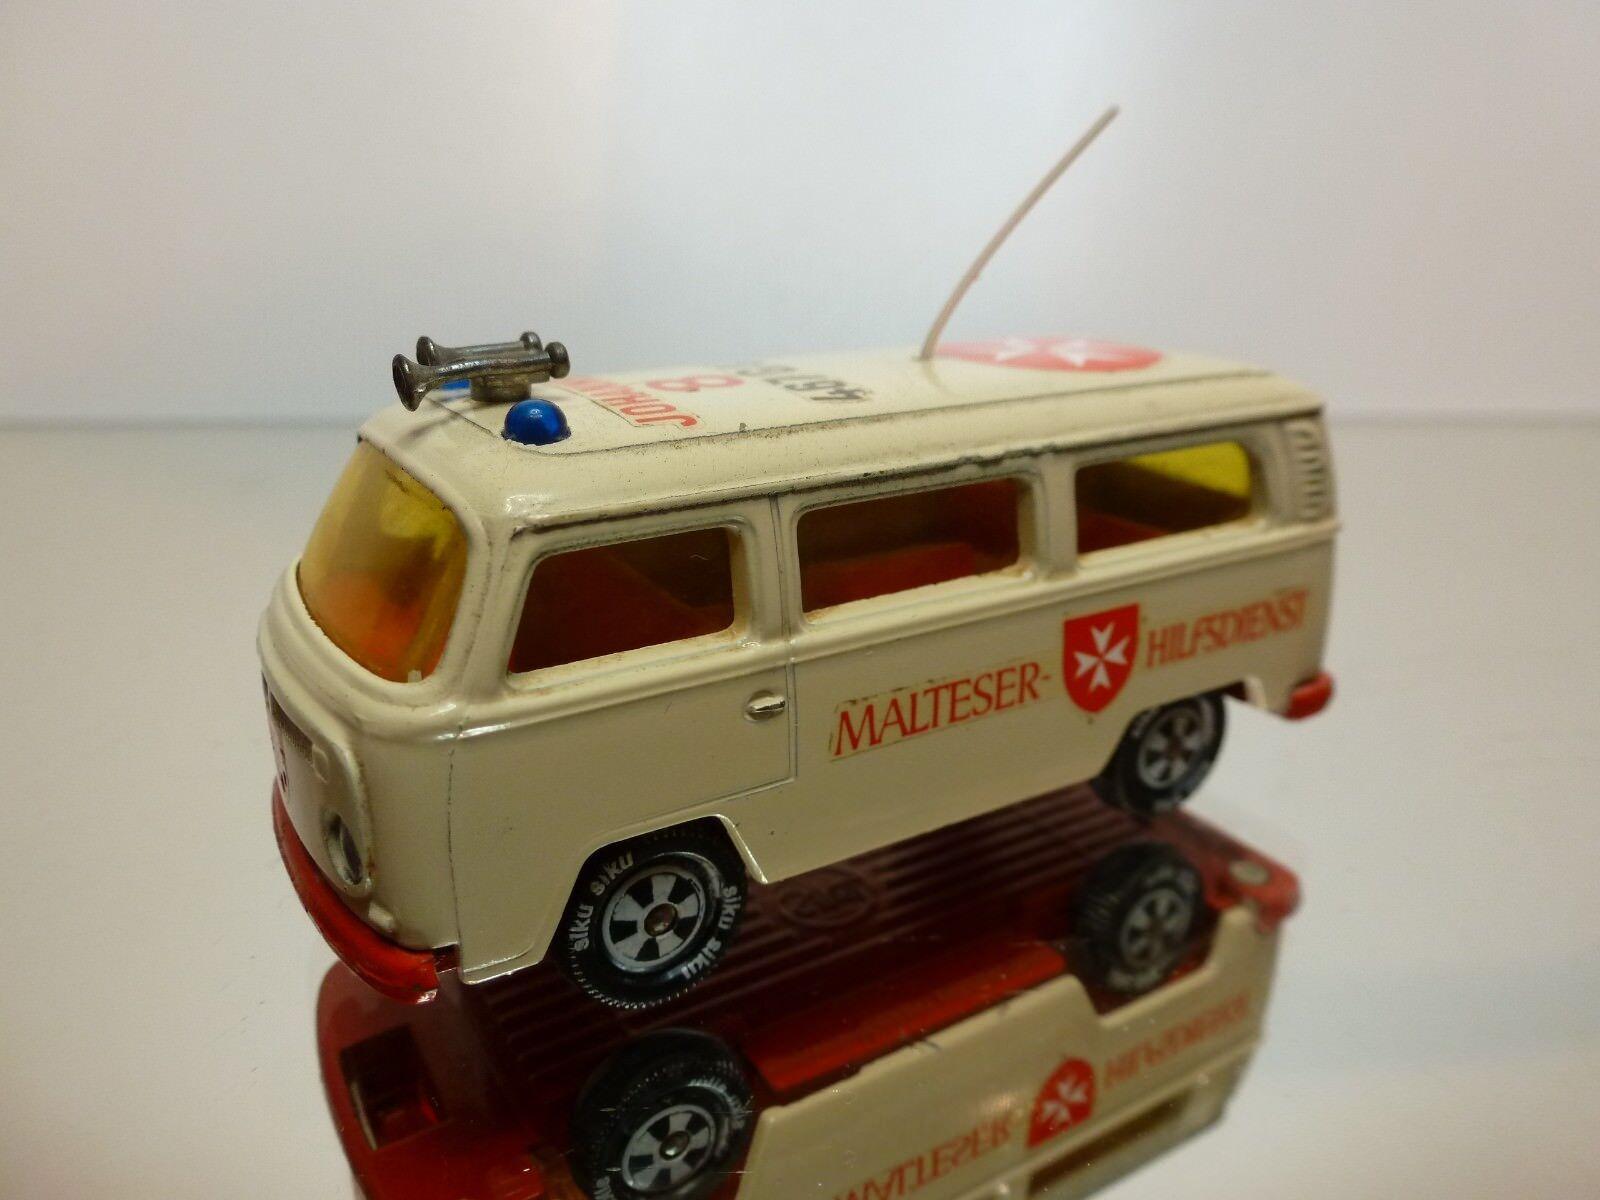 SIKU VW VOLKSWAGEN T2 buss - AMBULANCE MALTES HILFSDIENST - CRAM L7.0cm GOD